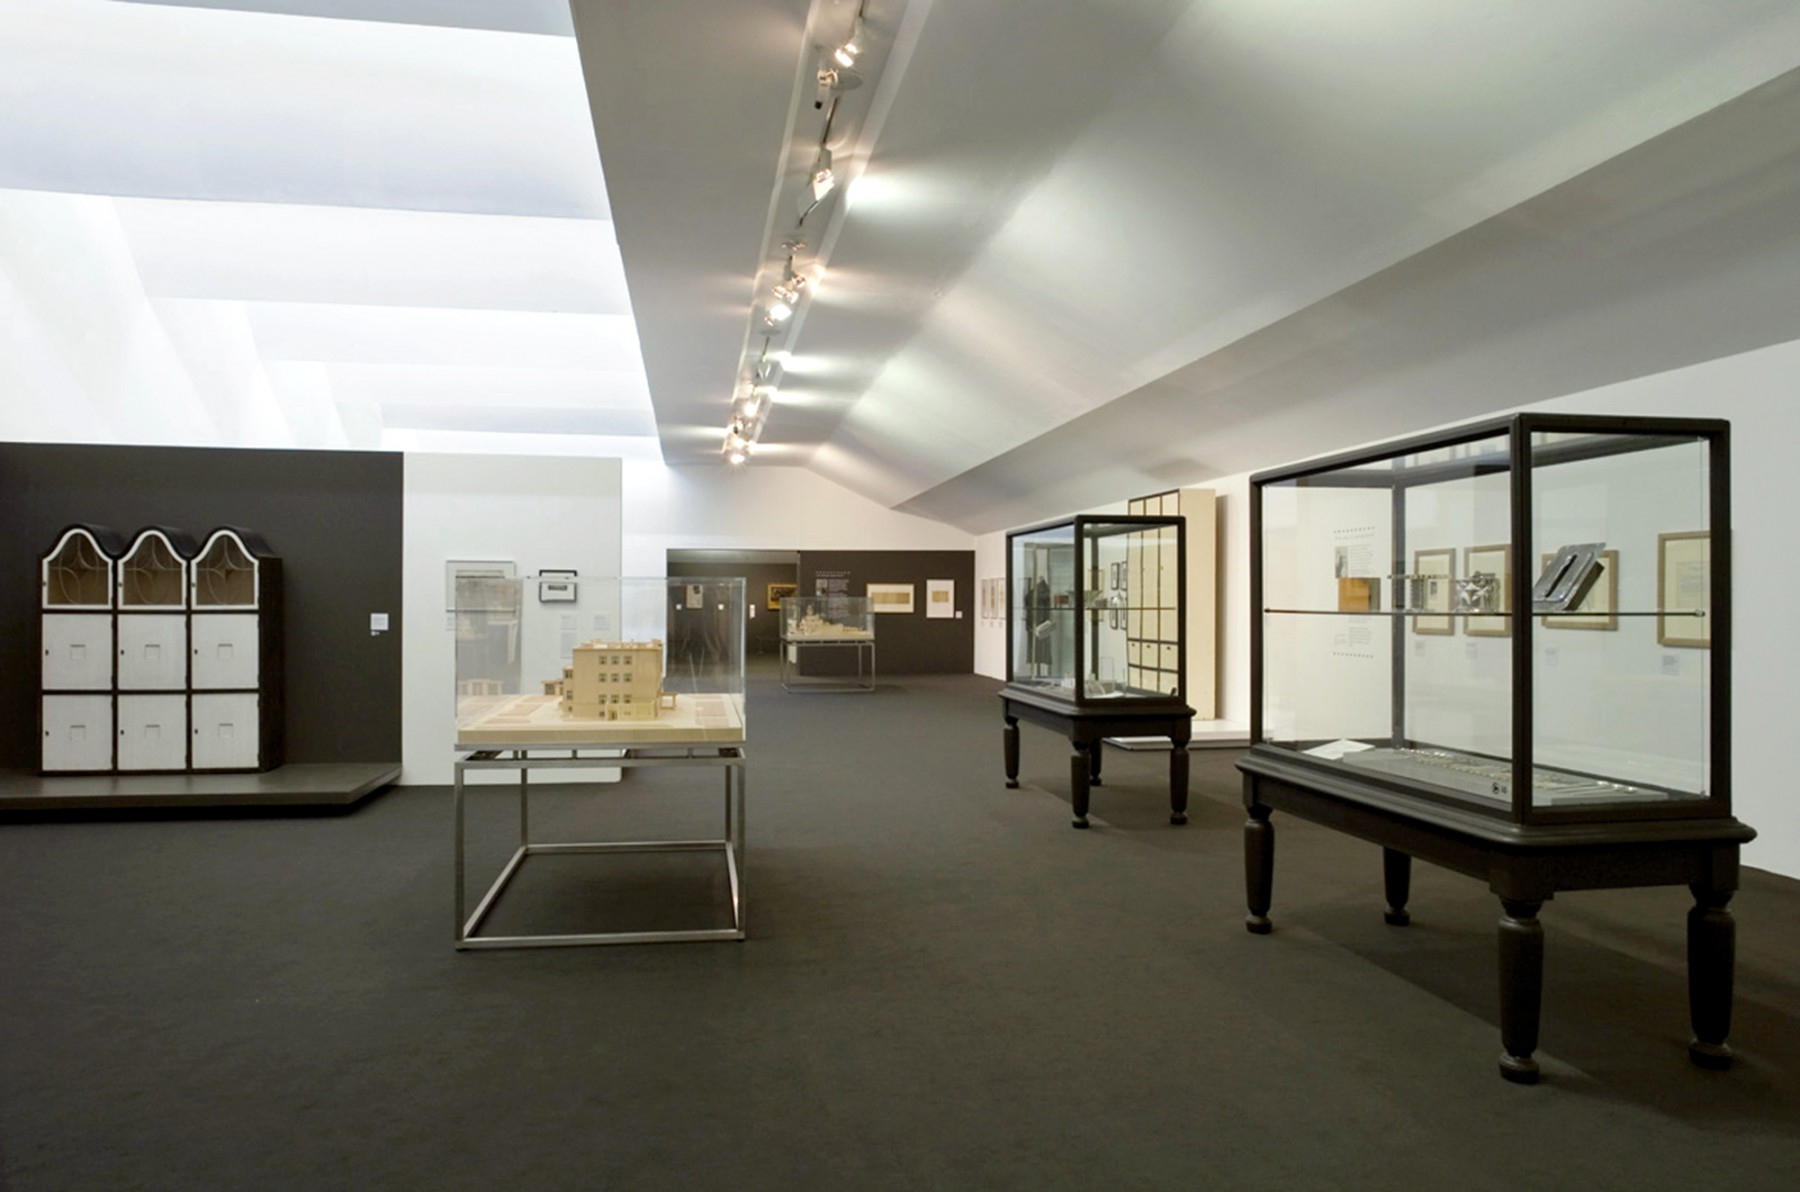 Gustav-Klimt-Painting-Design-Modern-Life-Vienna-Secession-Tate-Liverpool-art-exhibition-gallery-Jamie-Fobert-Architects-3